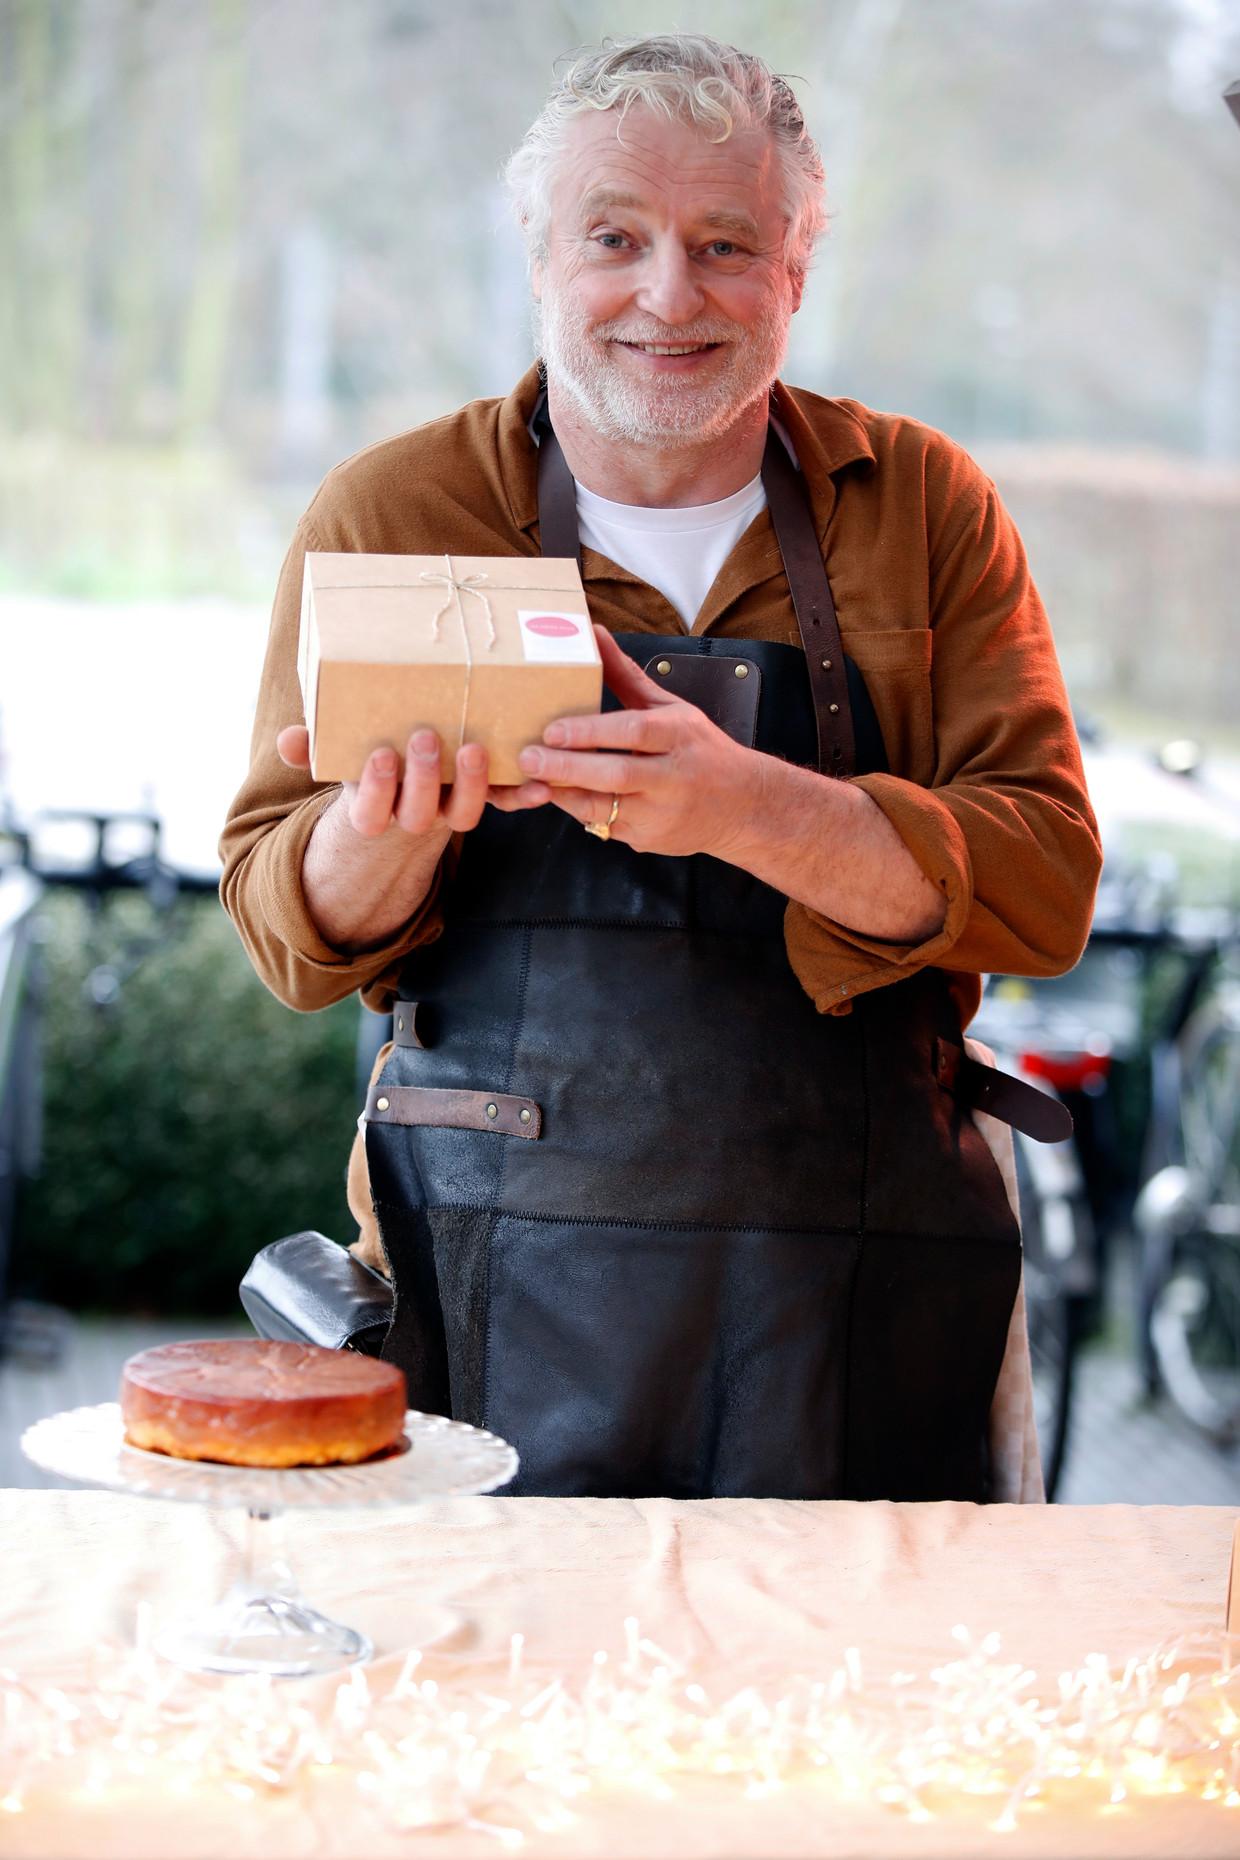 Filip Peeters  Verkoopt tarte tatin  Hove Butcher store  januari 2021 Beeld Kristof Ghyselinck